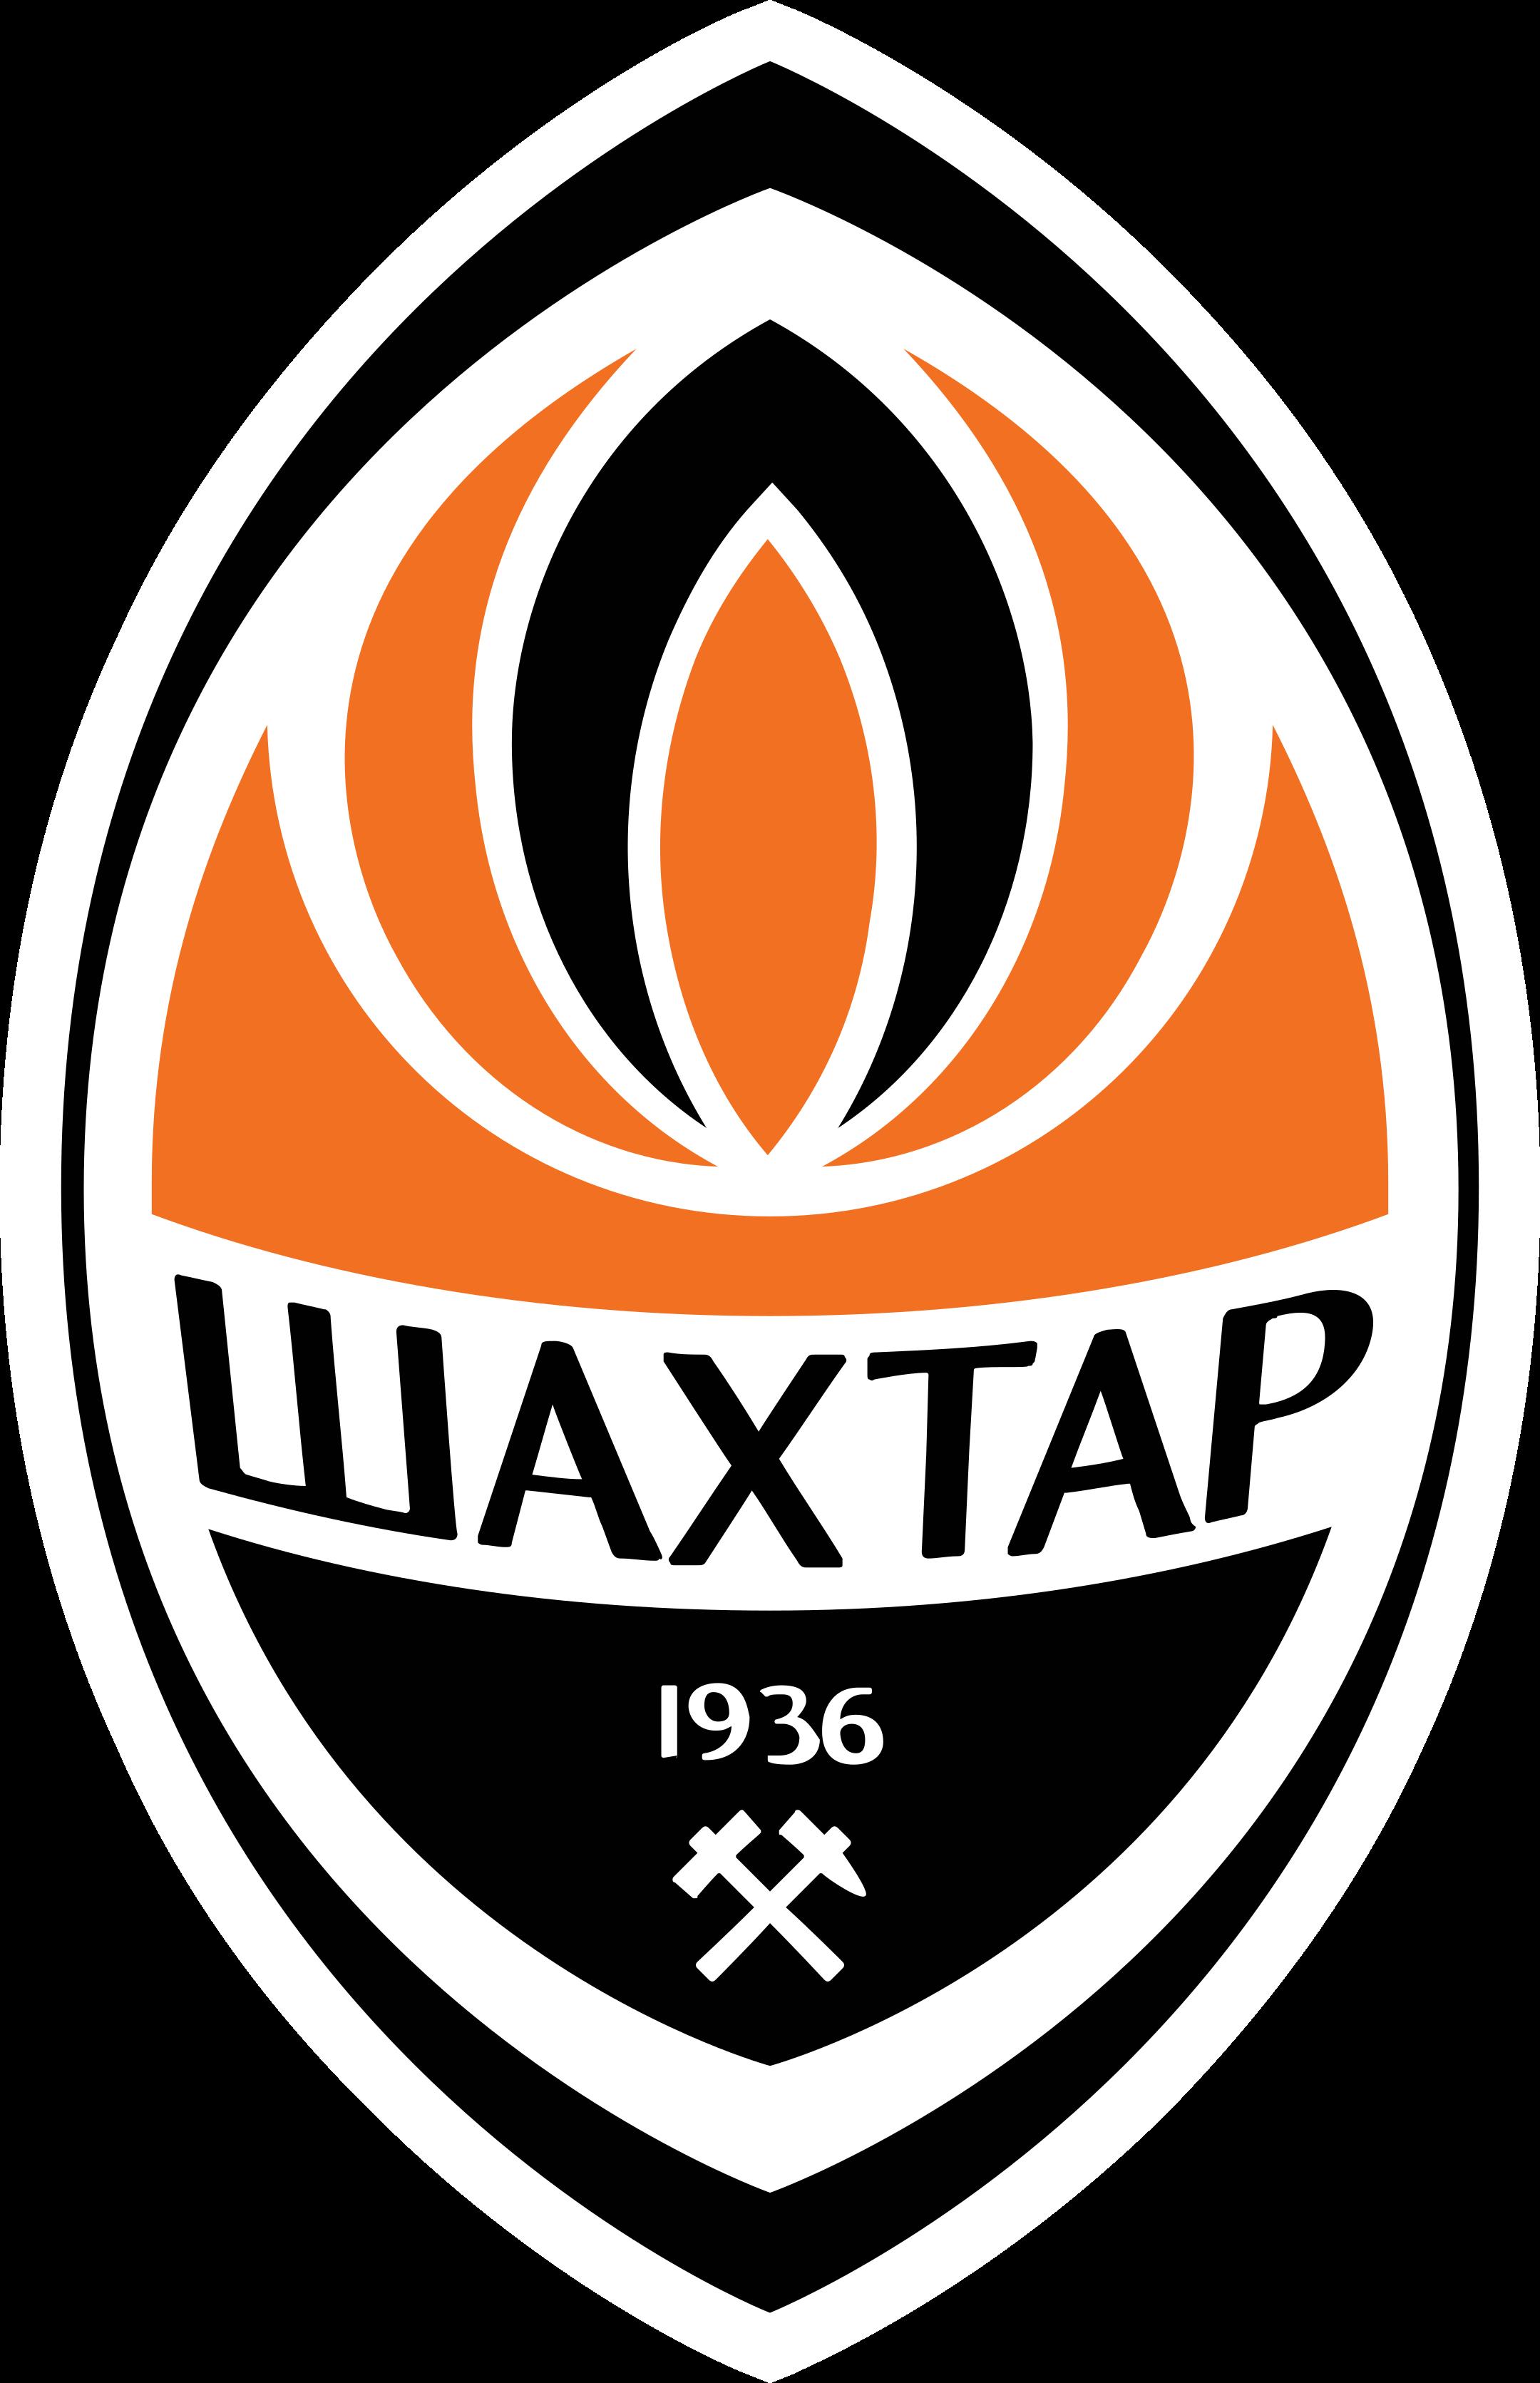 shakhtar logo 1 - FK Shakhtar Logo - Escudo